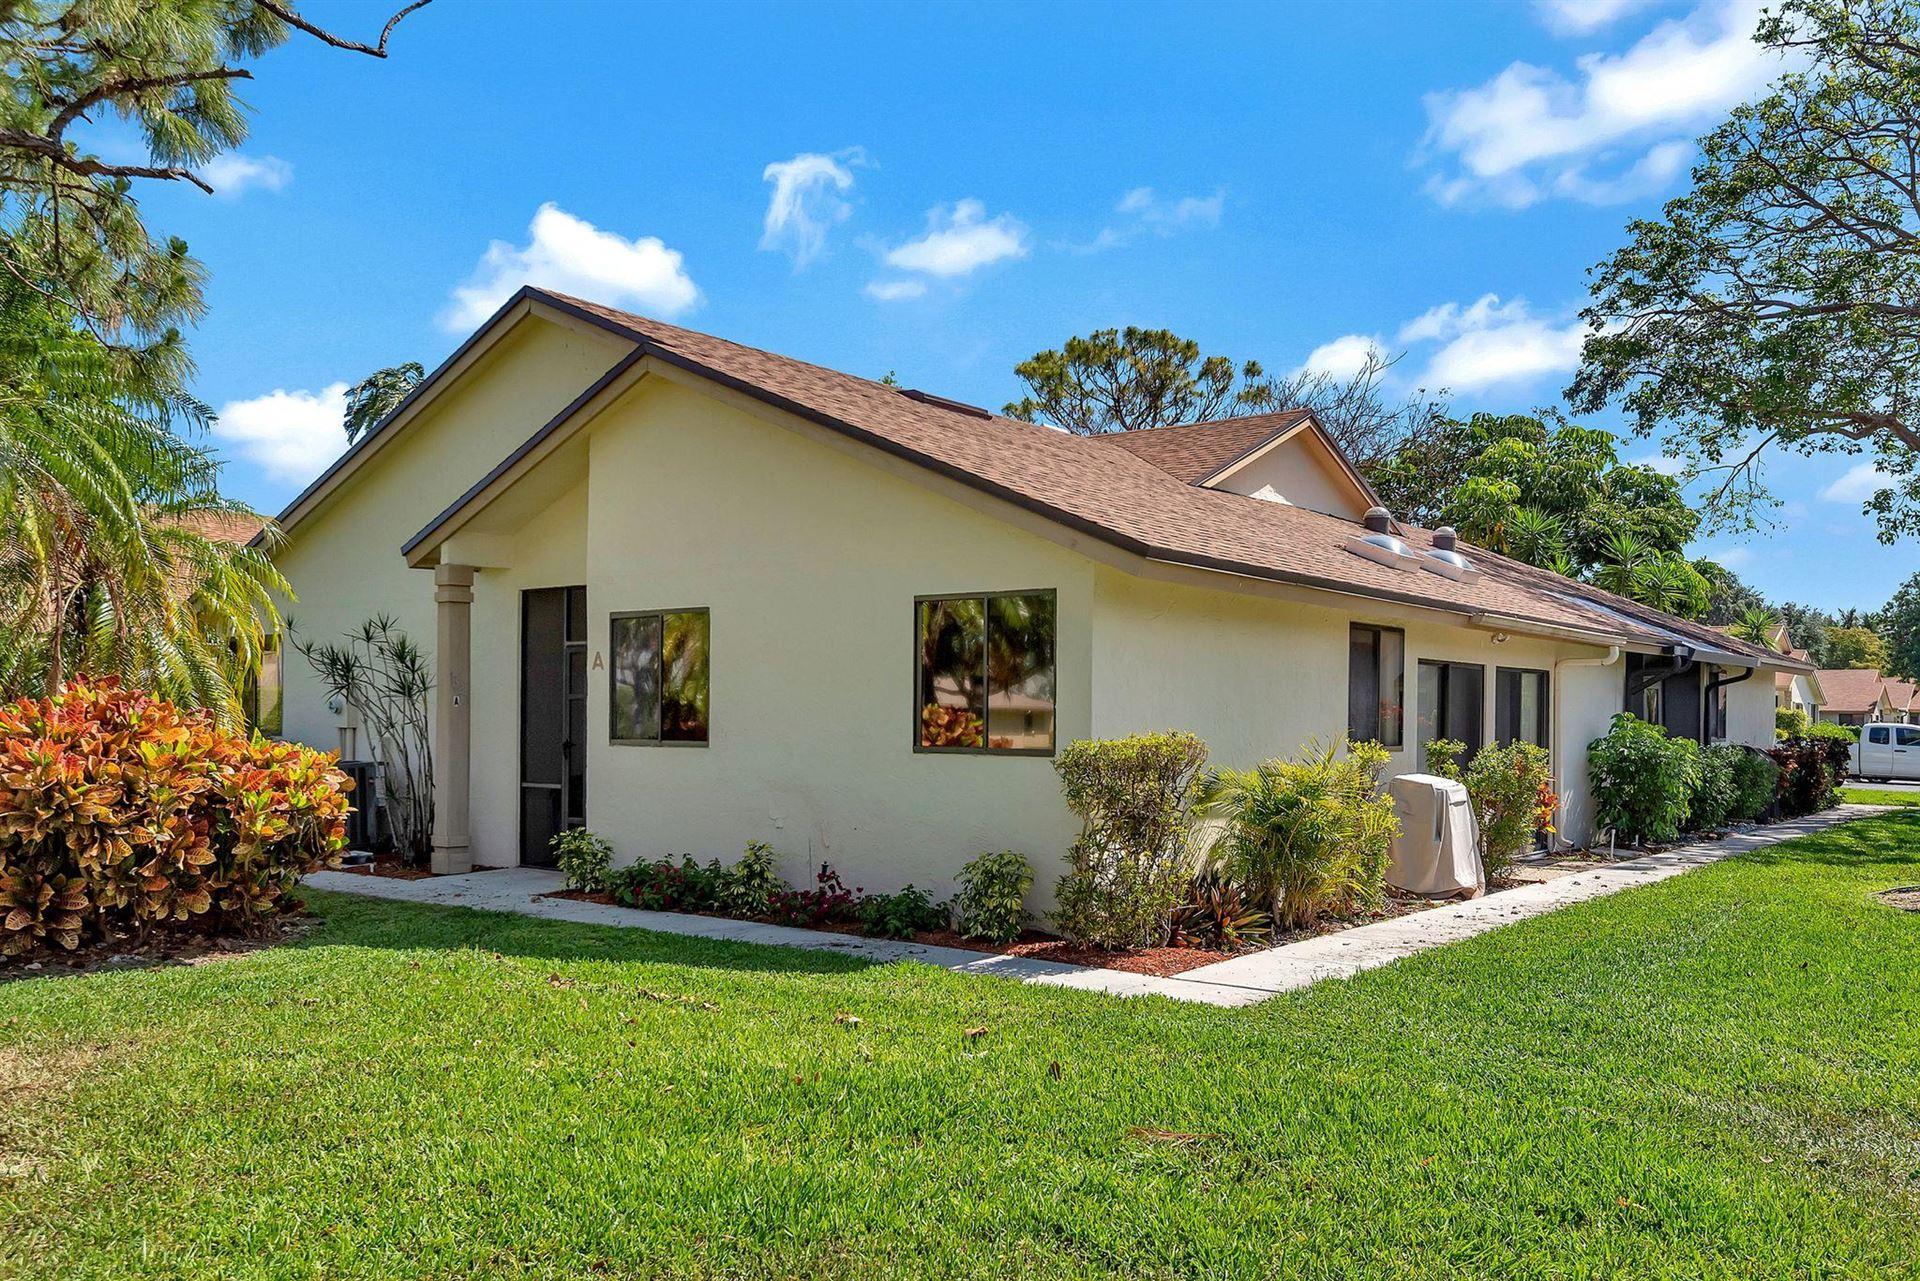 1320 NW 29th Avenue #A, Delray Beach, FL 33445 - #: RX-10706224